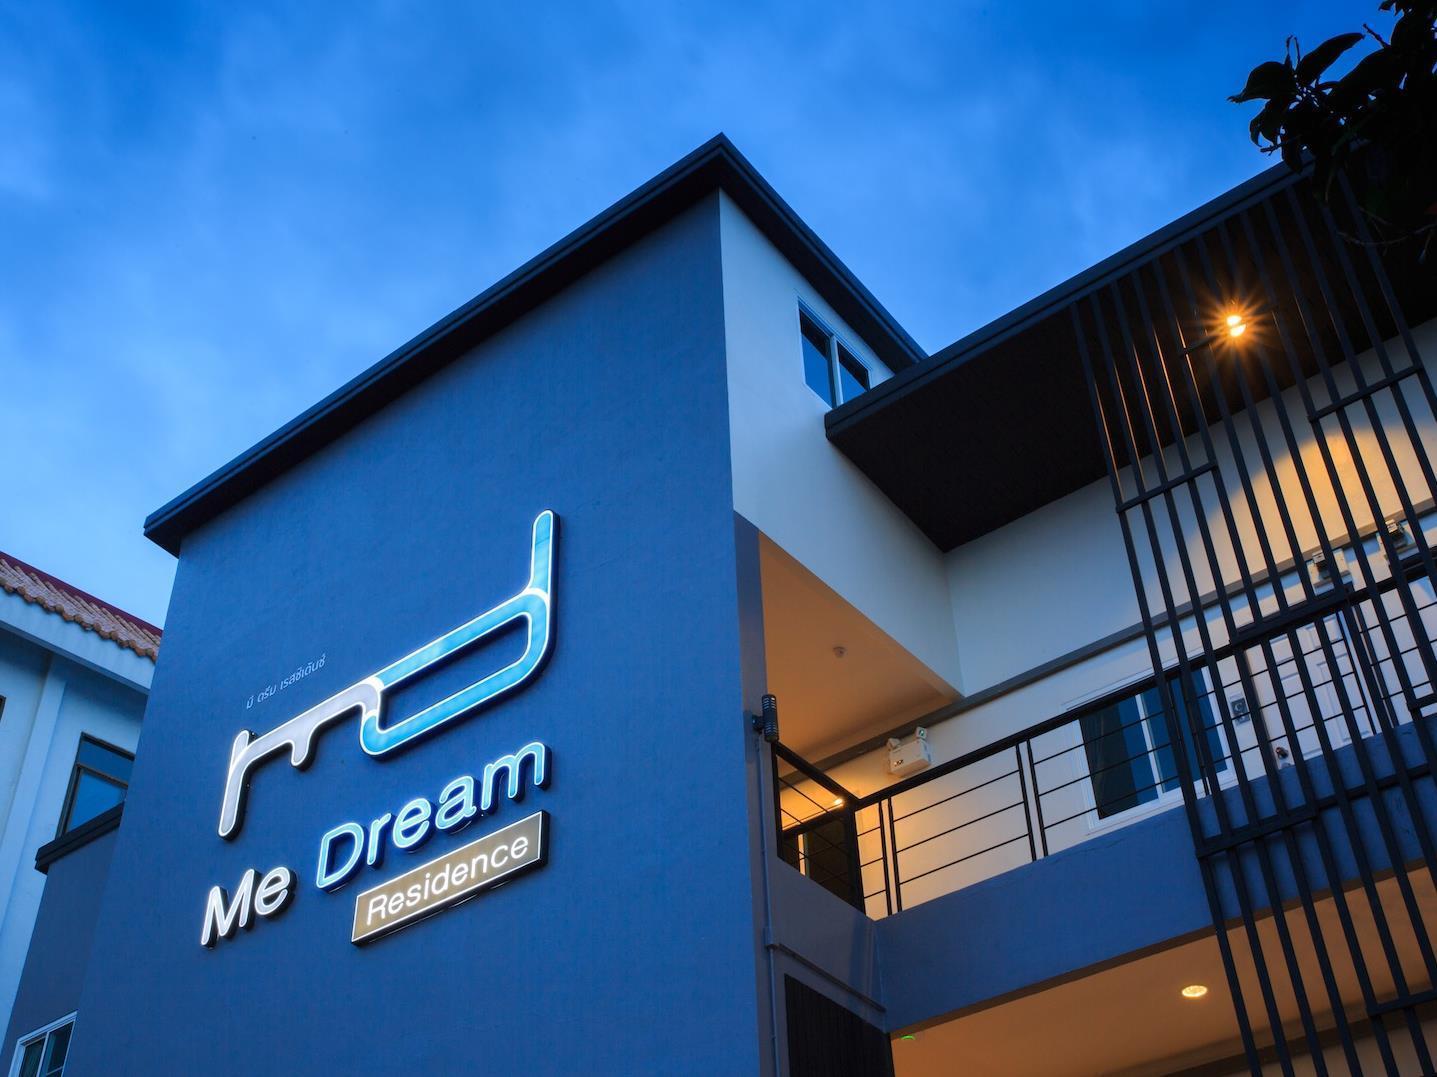 Me Dream Residence มี ดรีม เรสซิเดนซ์